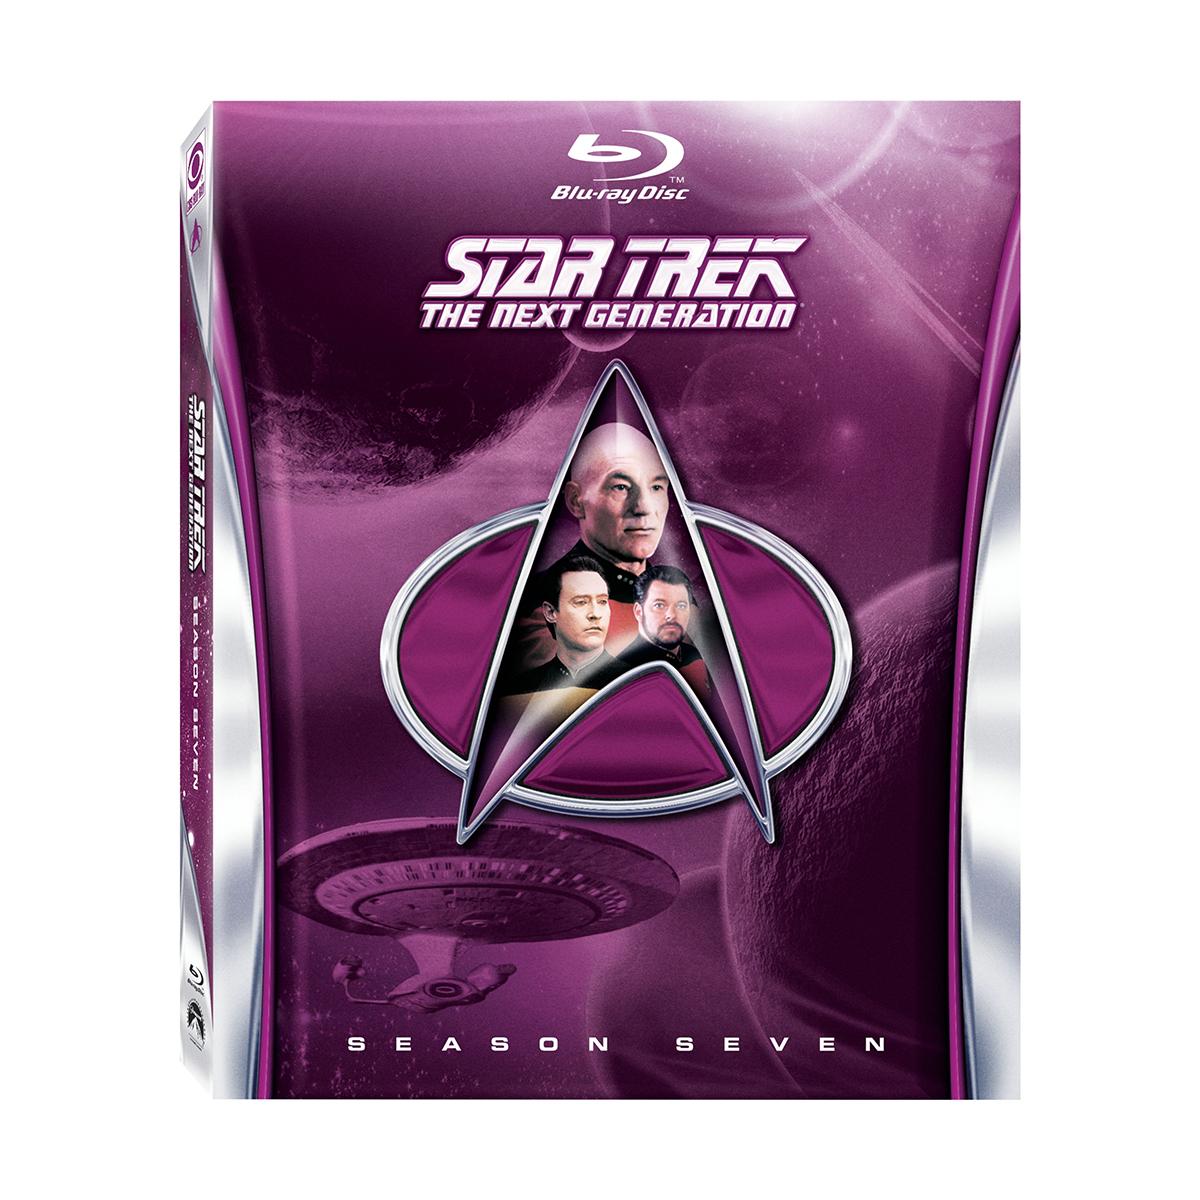 Star Trek: The Next Generation - Season 7 Blu-ray